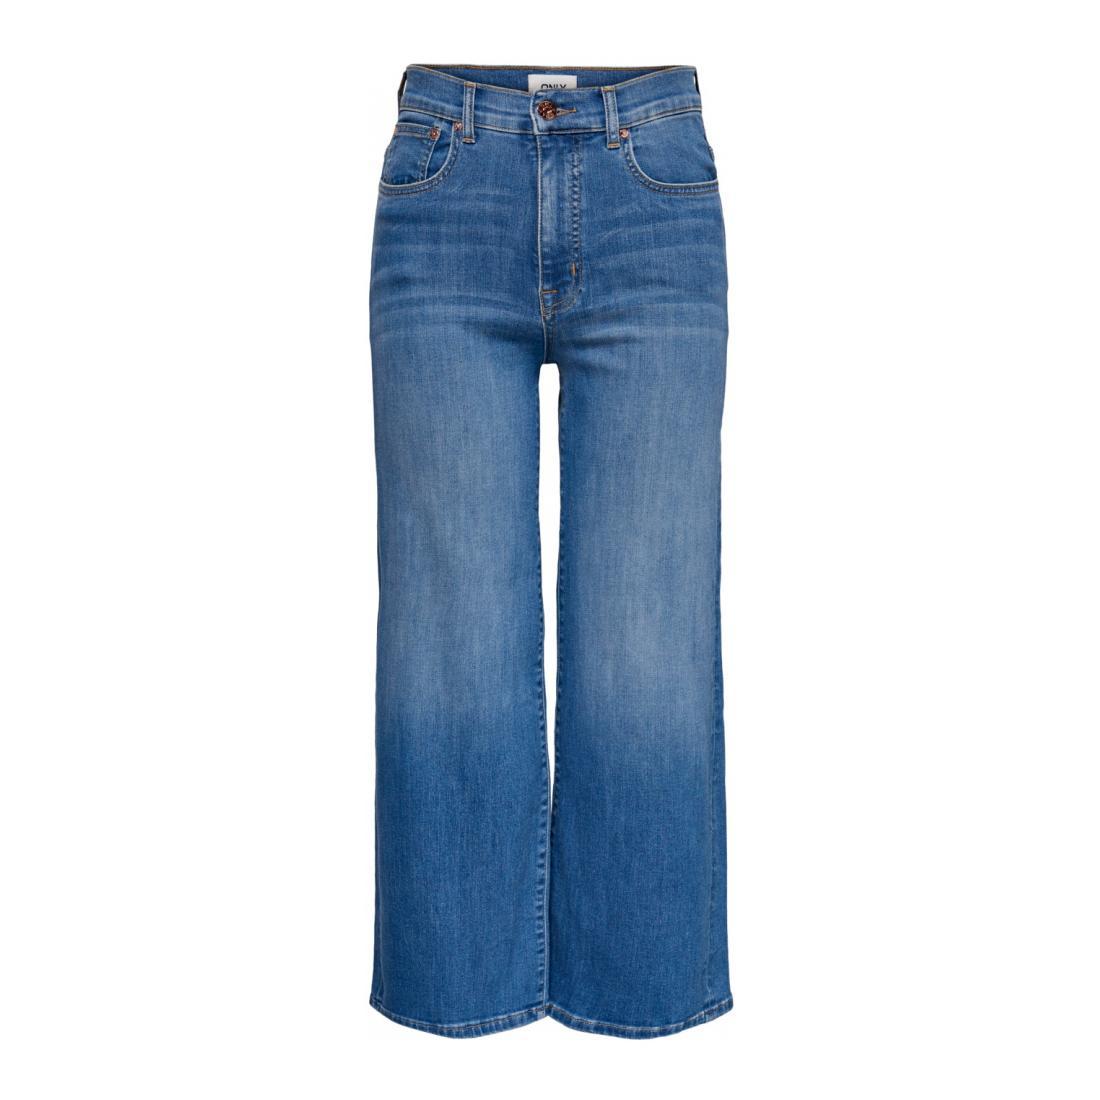 Only Jeans Damen ONLMADISON HW WD CROP B D